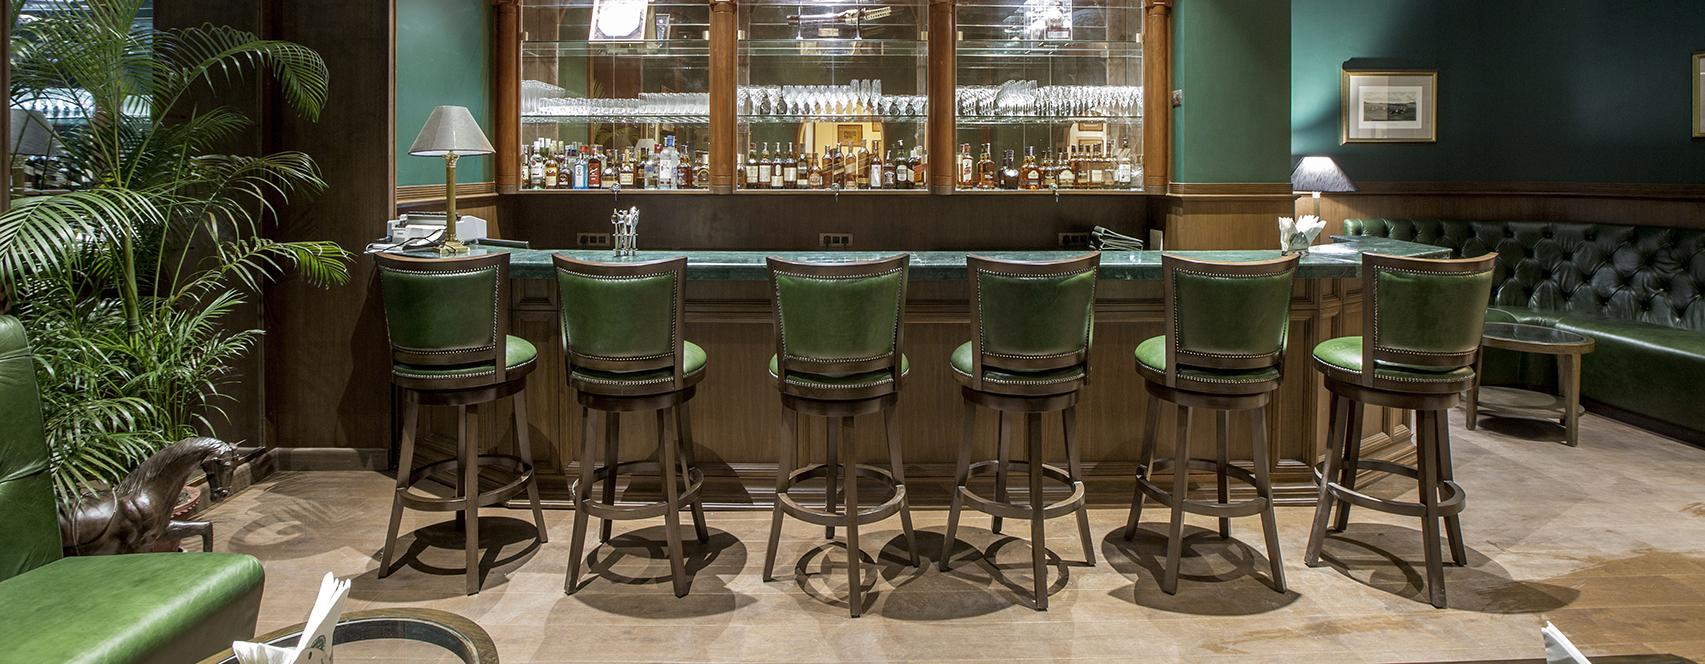 bar stools in tollygunge club